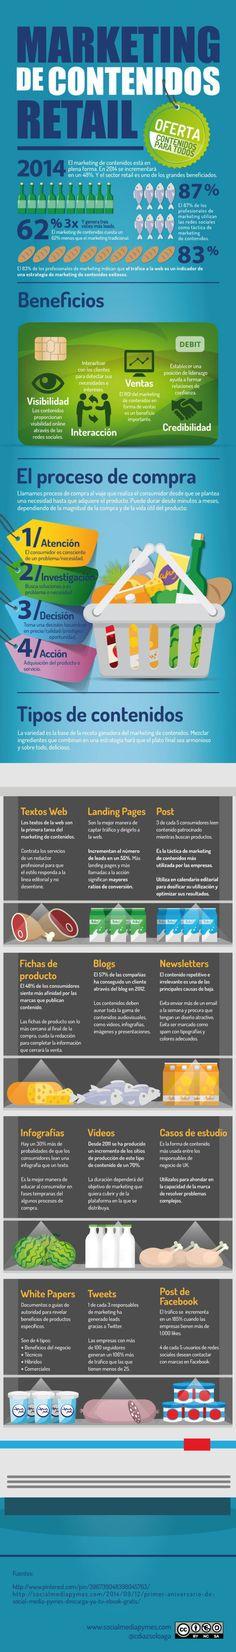 Marketing de contenidos para el sector retail #infografia #infographic #marketing